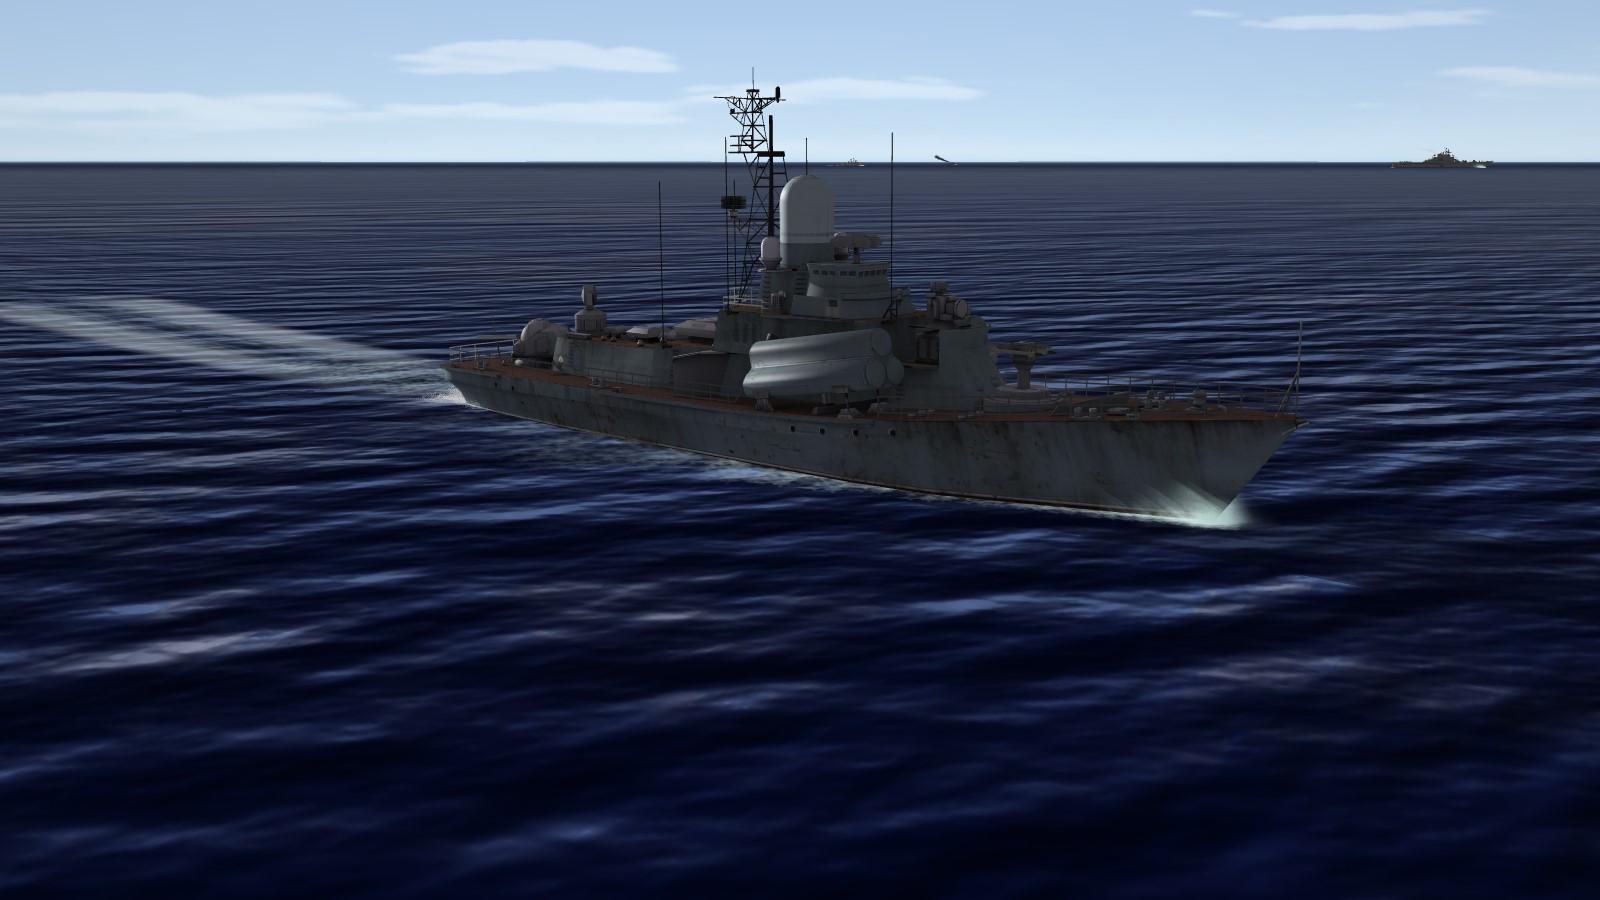 Nanuchka I & II class corvettes